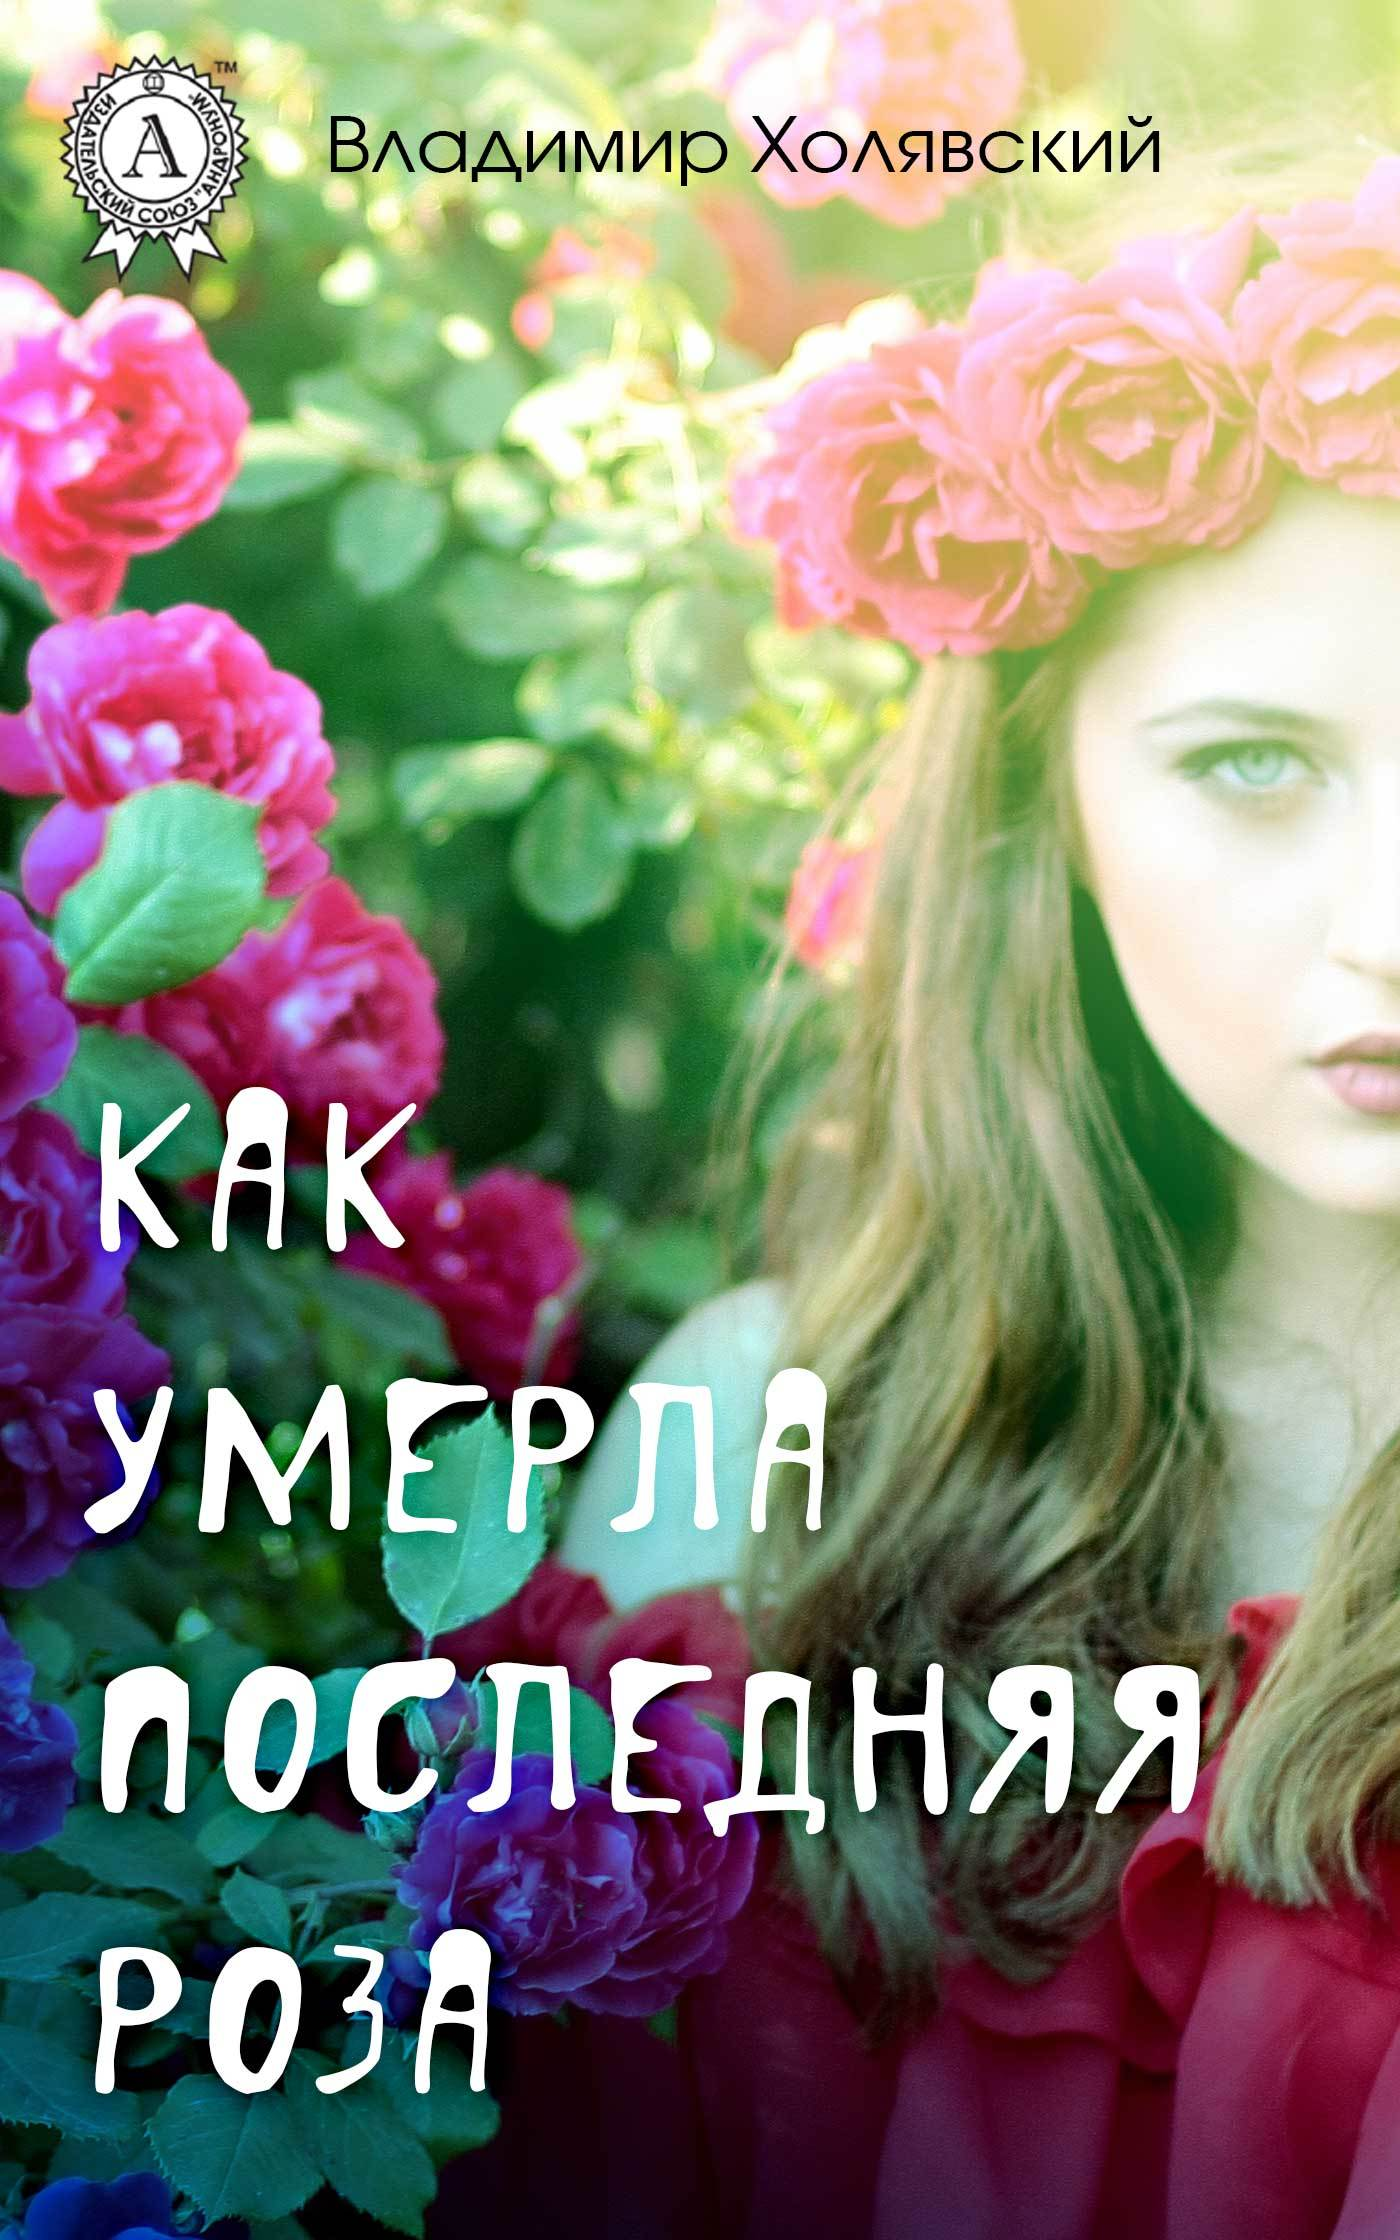 Владимир Холявский - Как умерла последняя роза